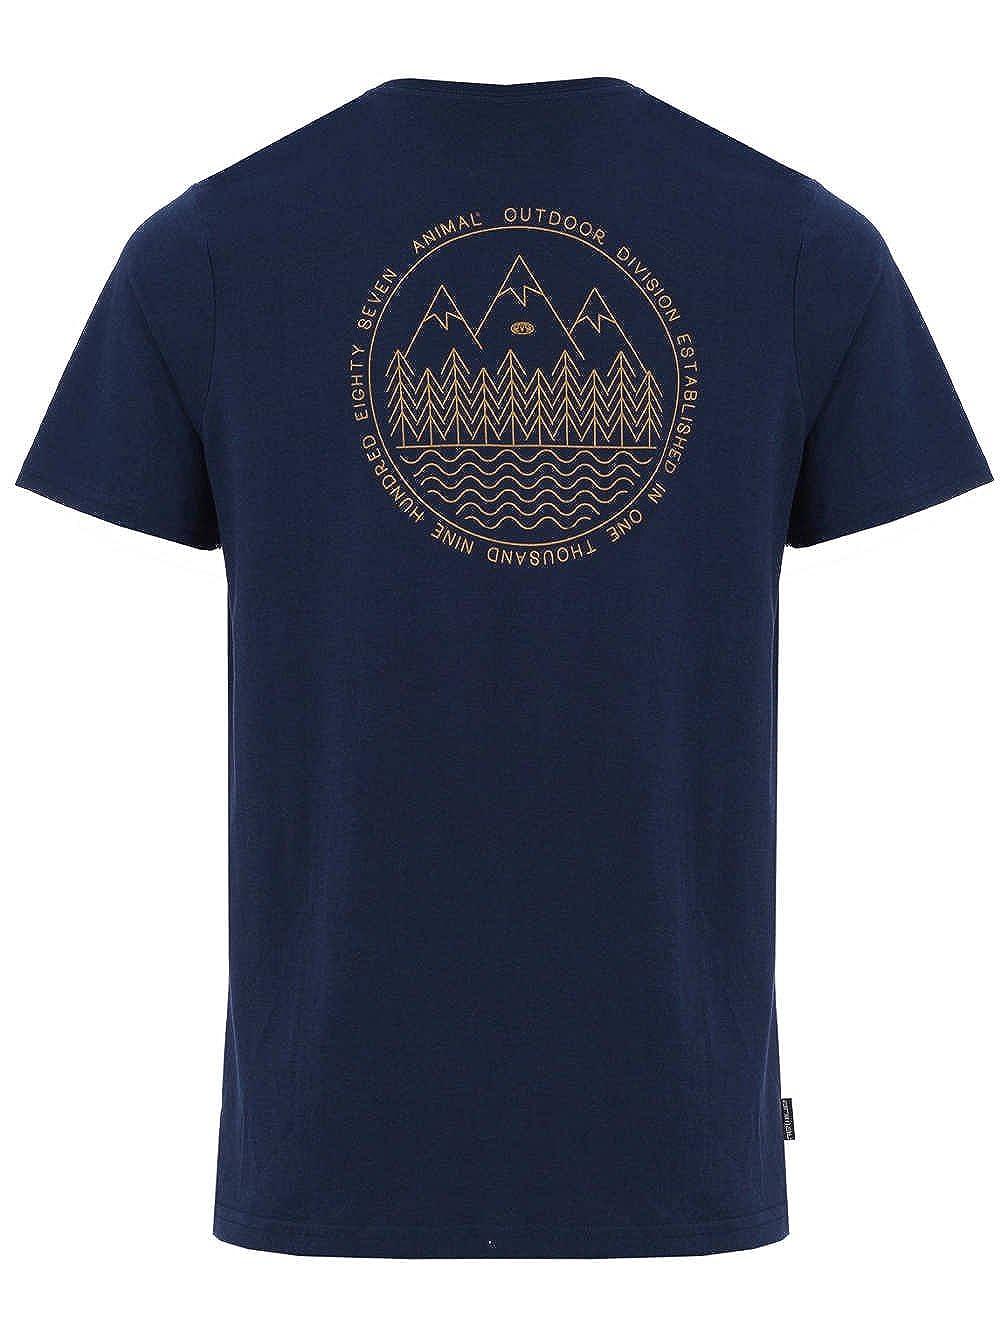 Animal Outdoors Short Sleeve T-Shirt in Dark Navy